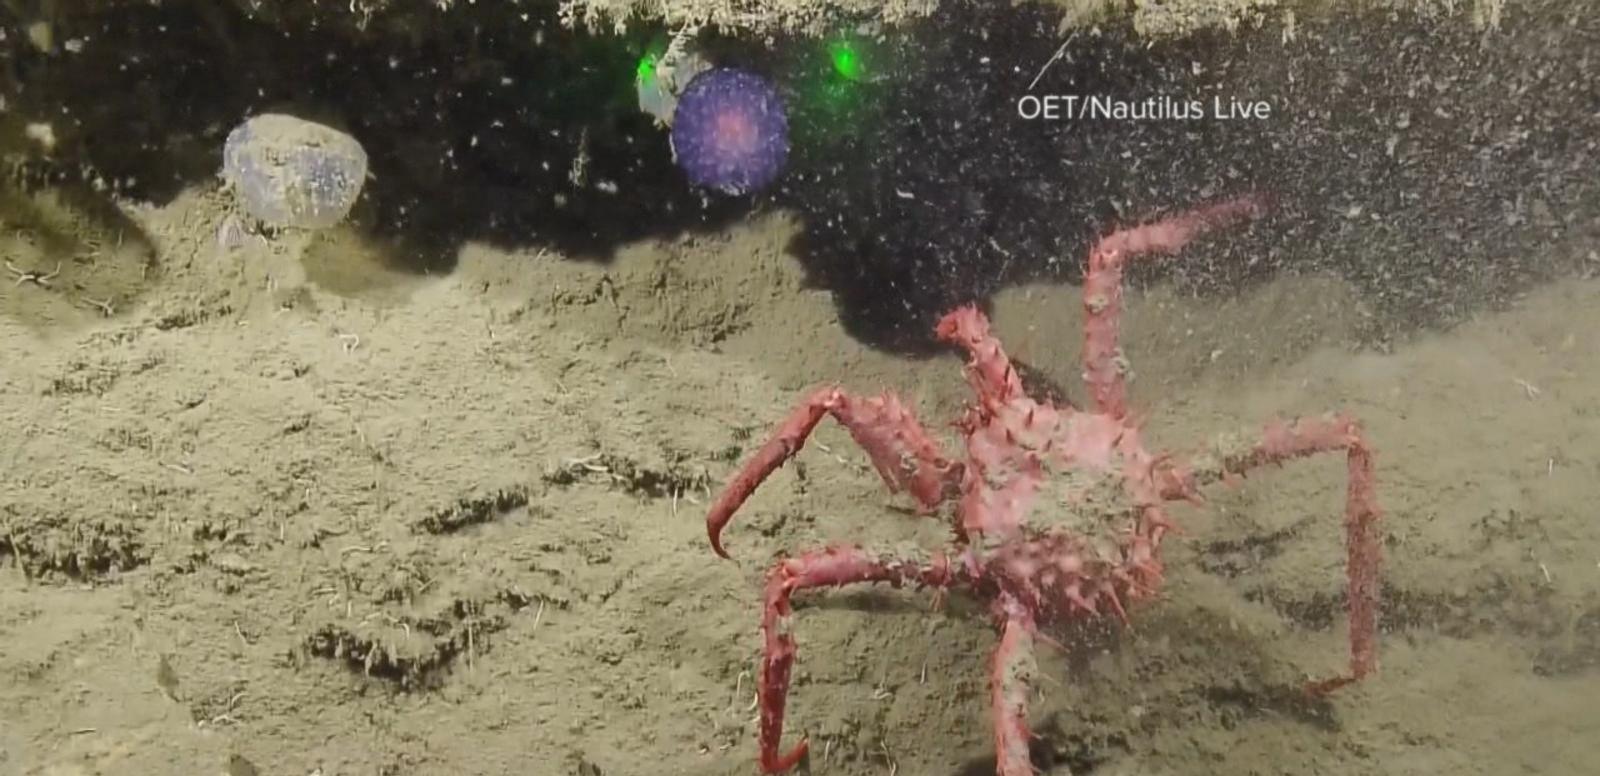 VIDEO: Mysterious Underwater Orb Baffles Scientists